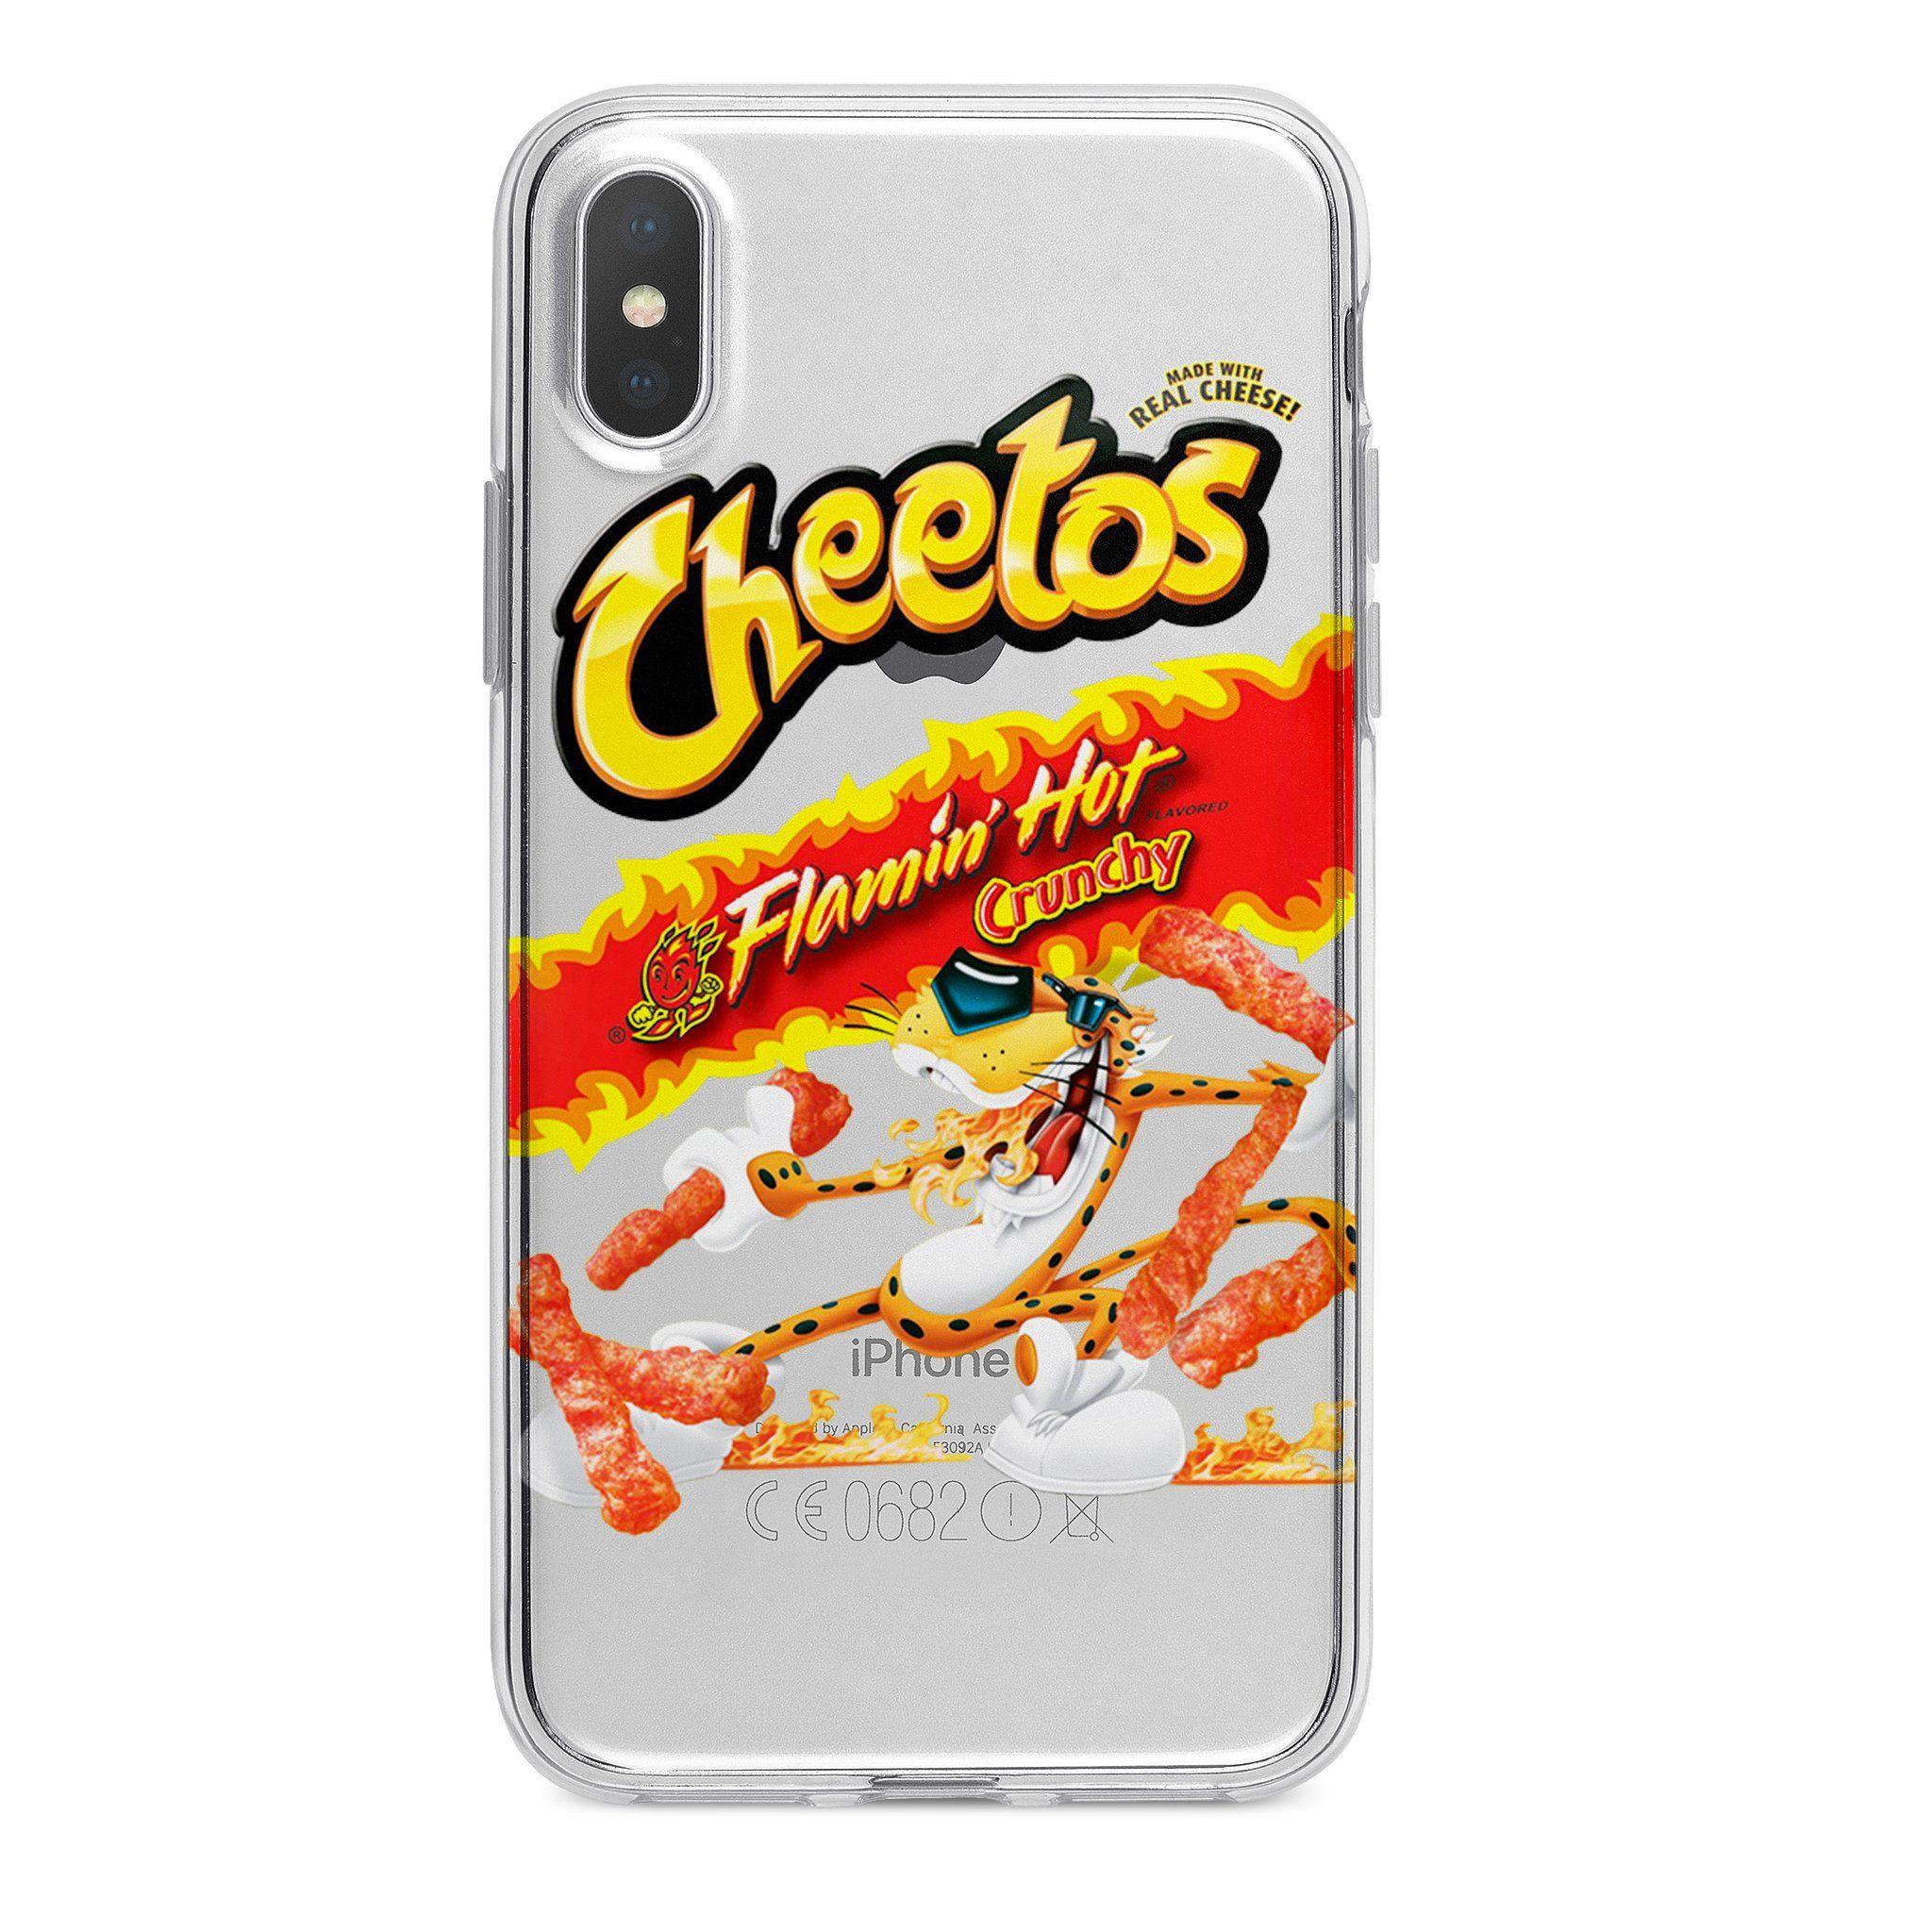 Clear hot cheetos custom iphone case custom iphone cases